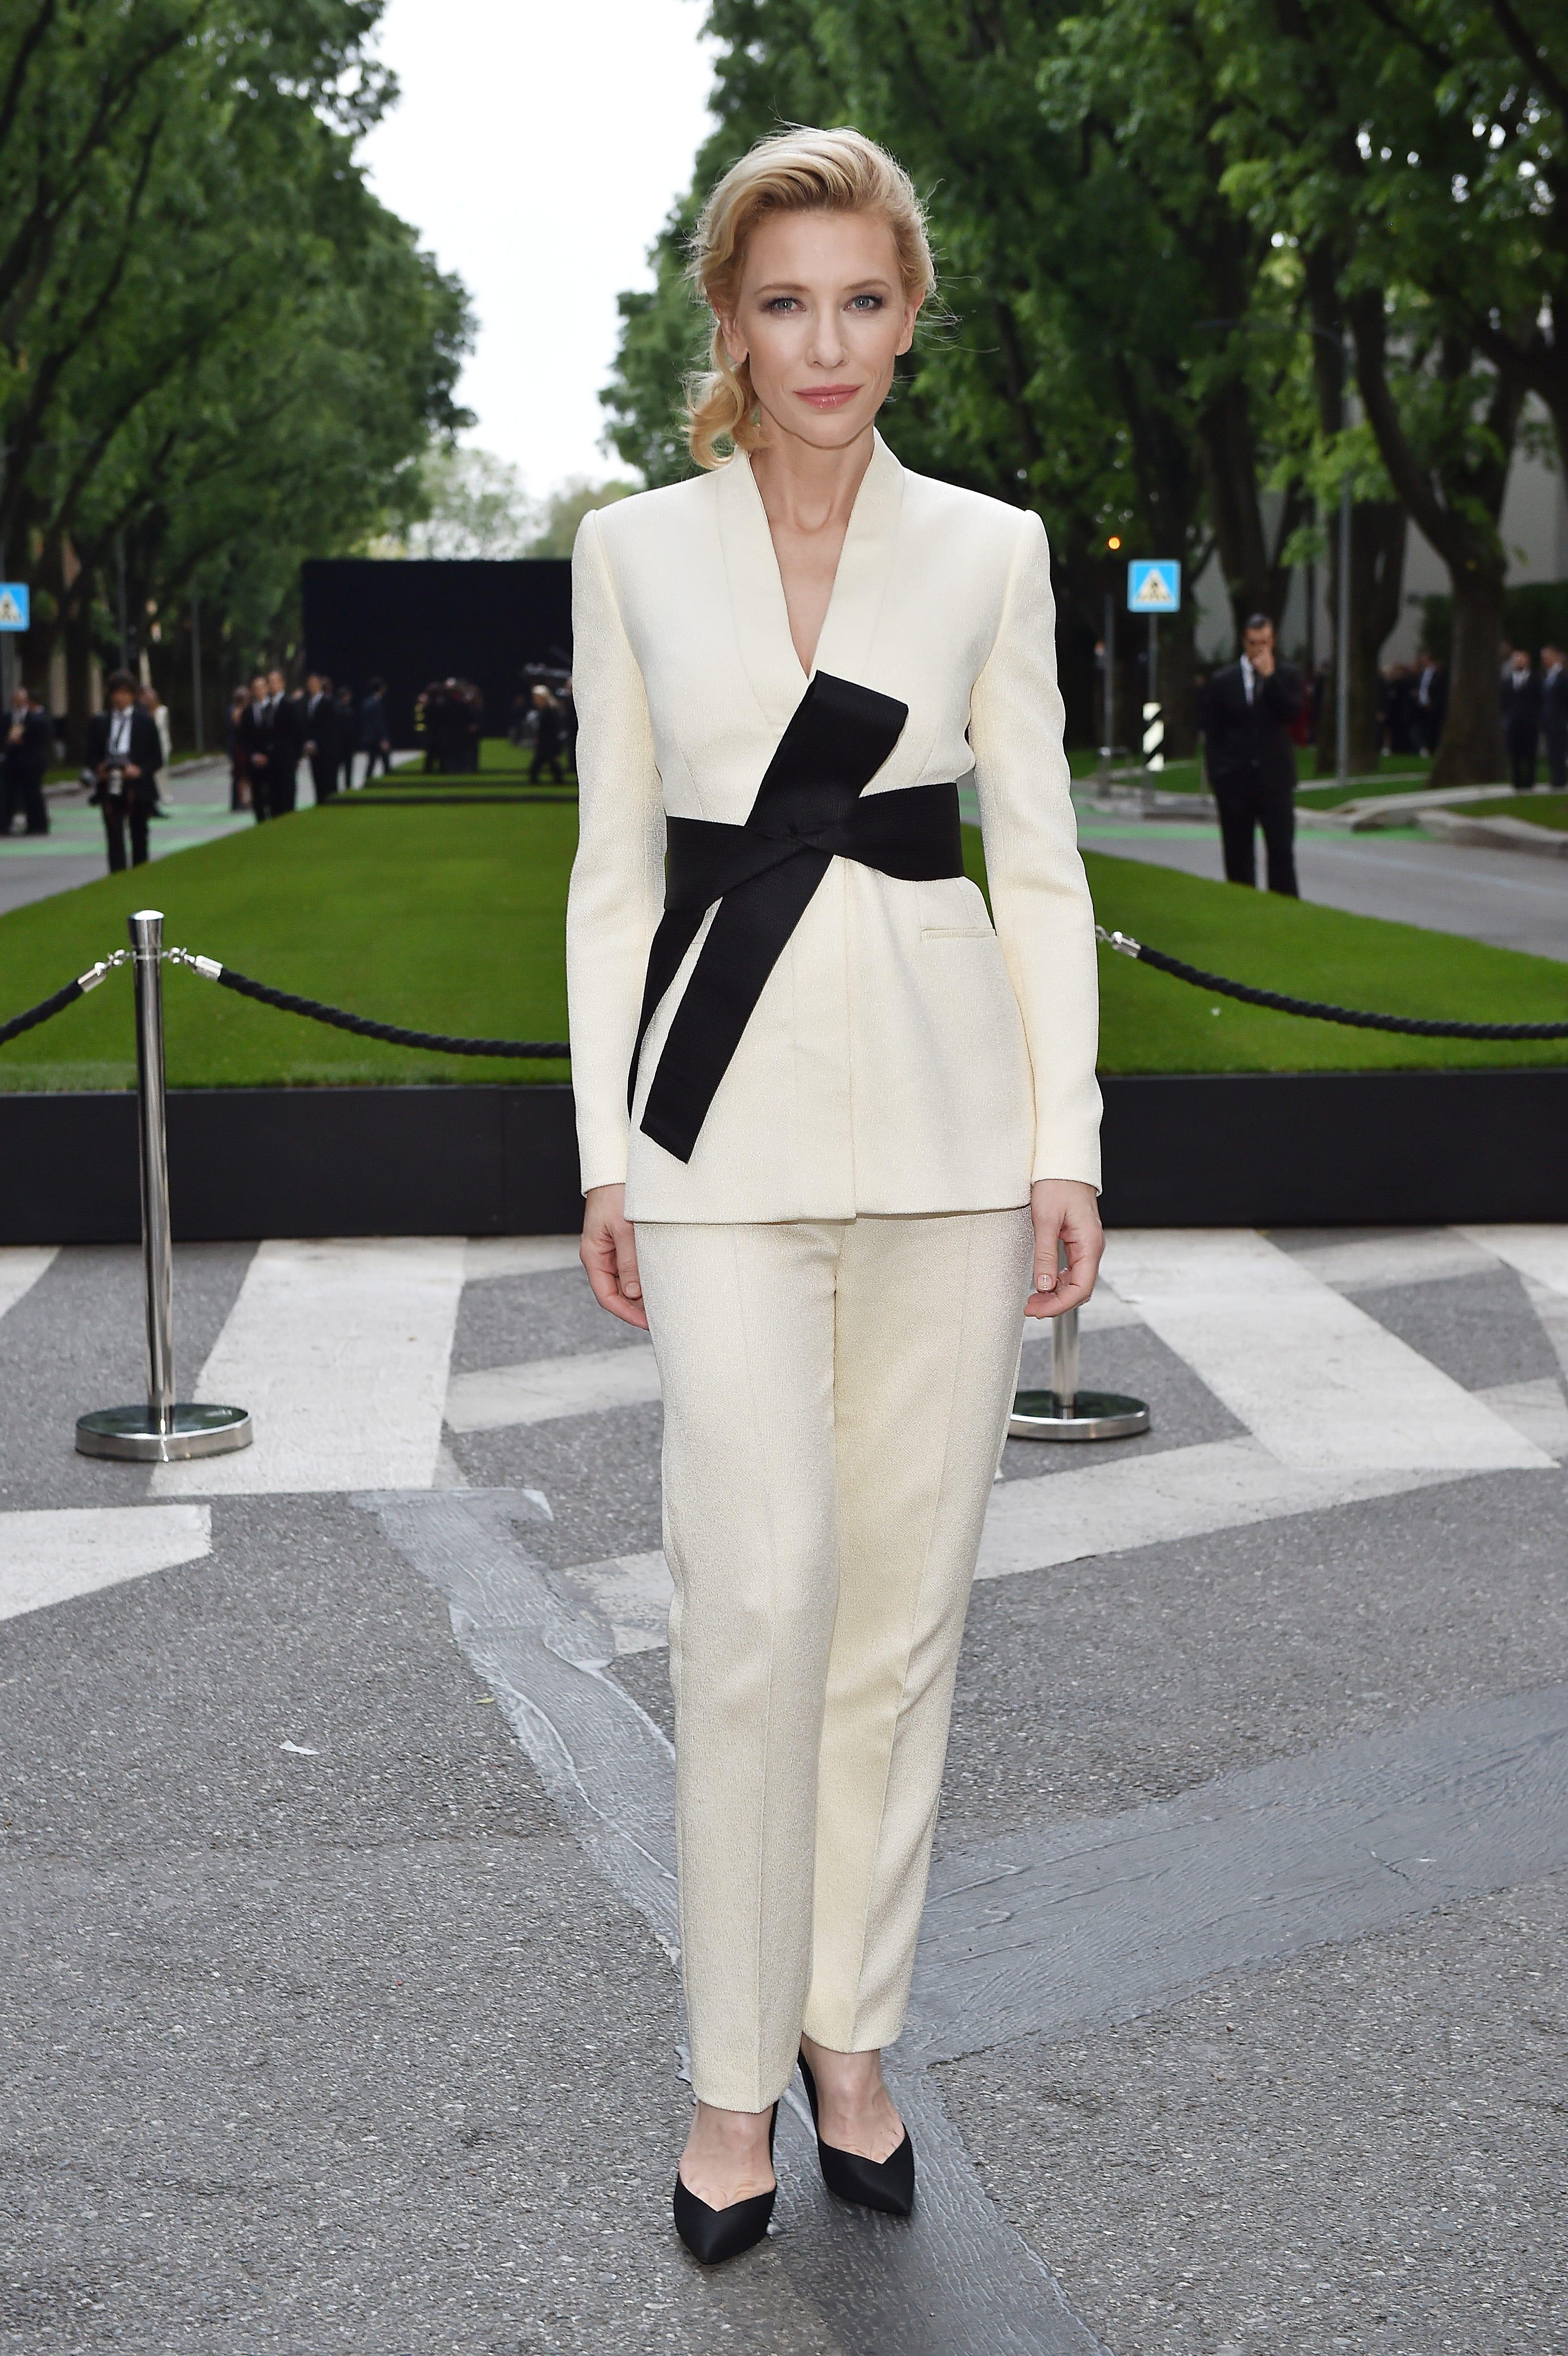 ICloud Cate Blanchett nude photos 2019